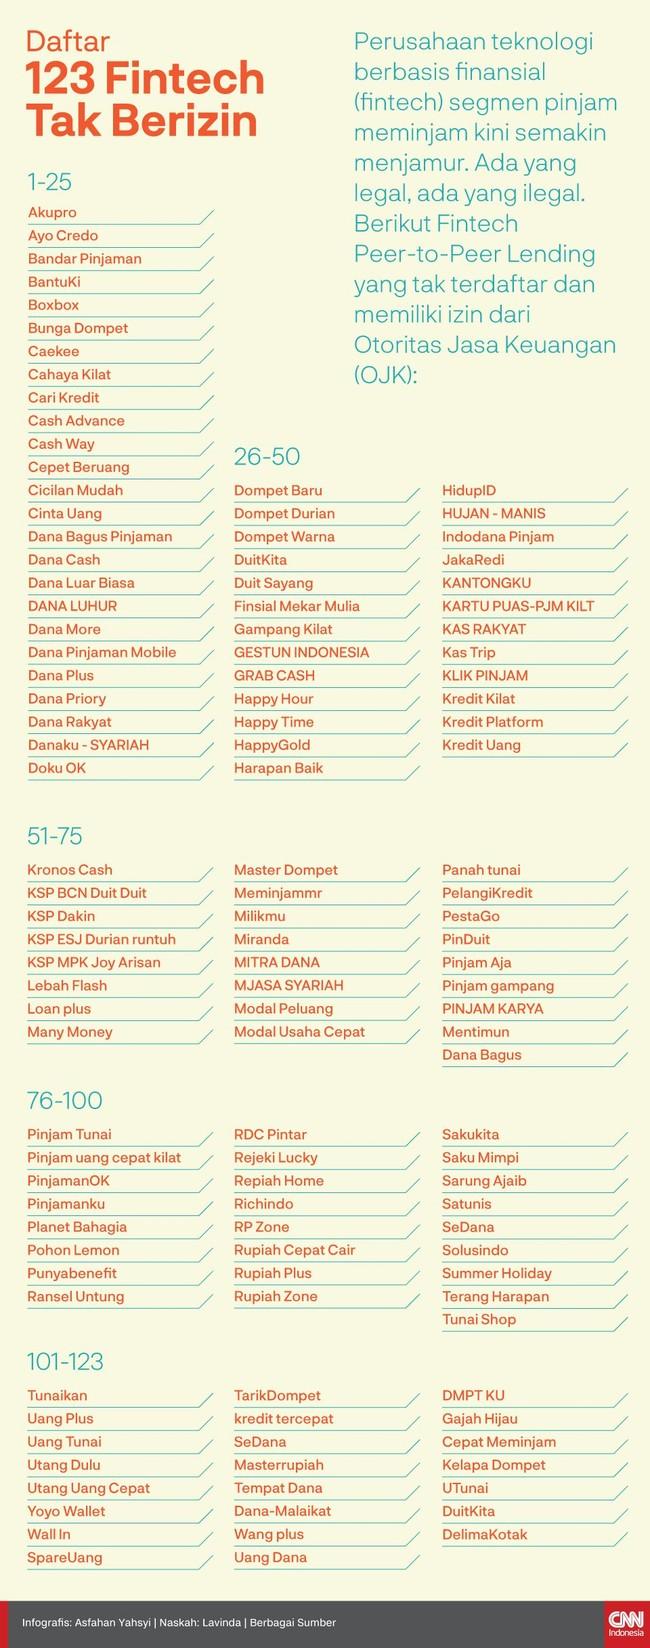 INFOGRAFIS: Daftar 123 Fintech yang Tak Memiliki Izin OJK